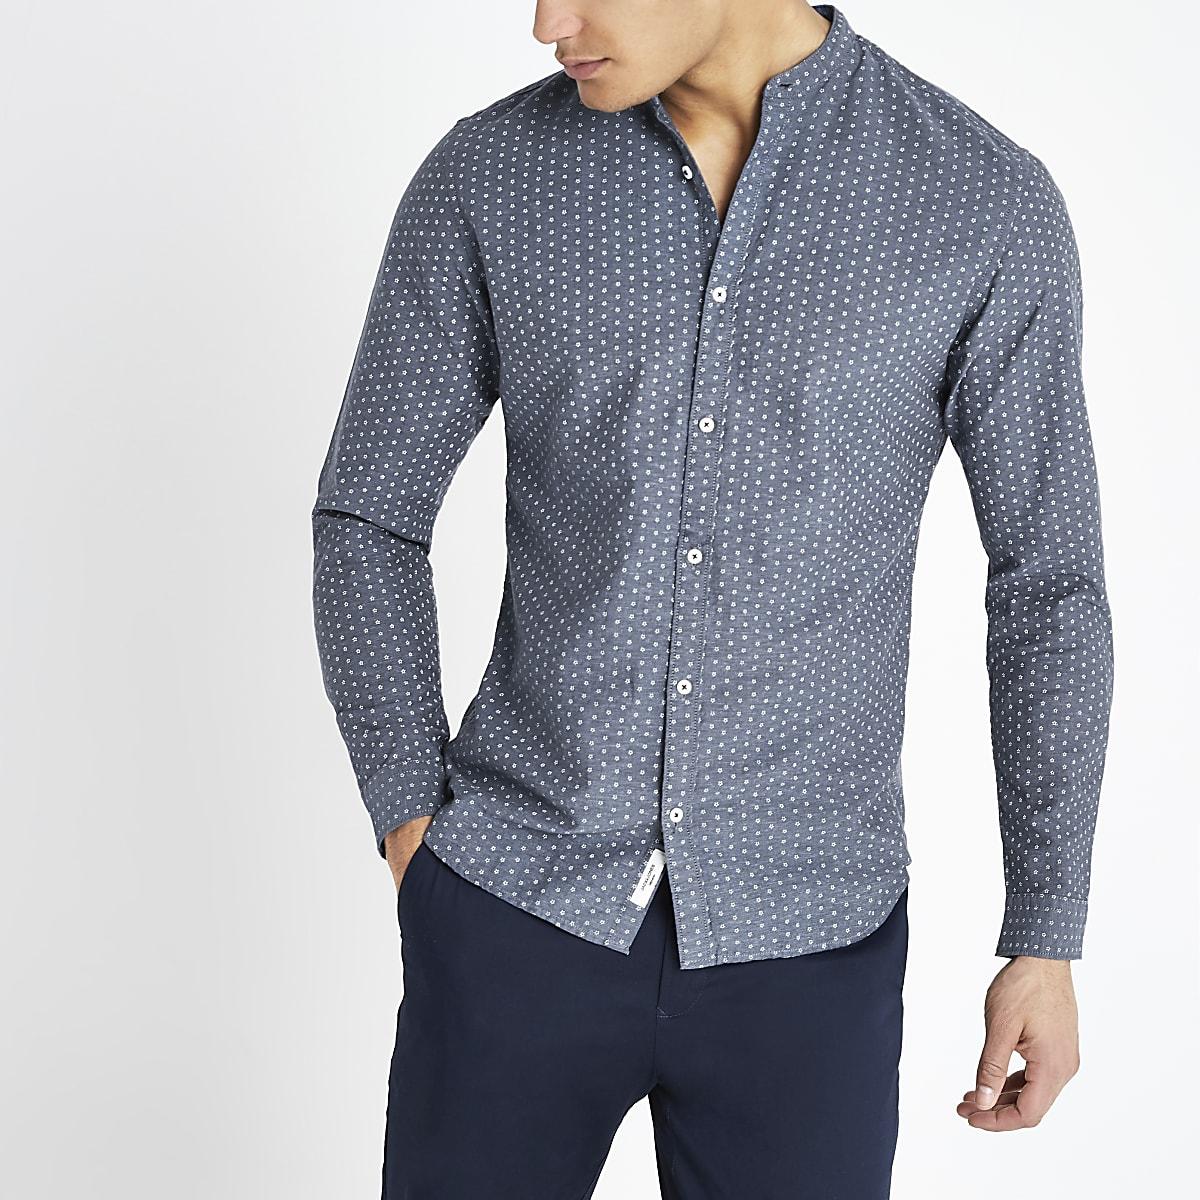 Jack & Jones – Marineblaues, bedrucktes Kurzarmhemd